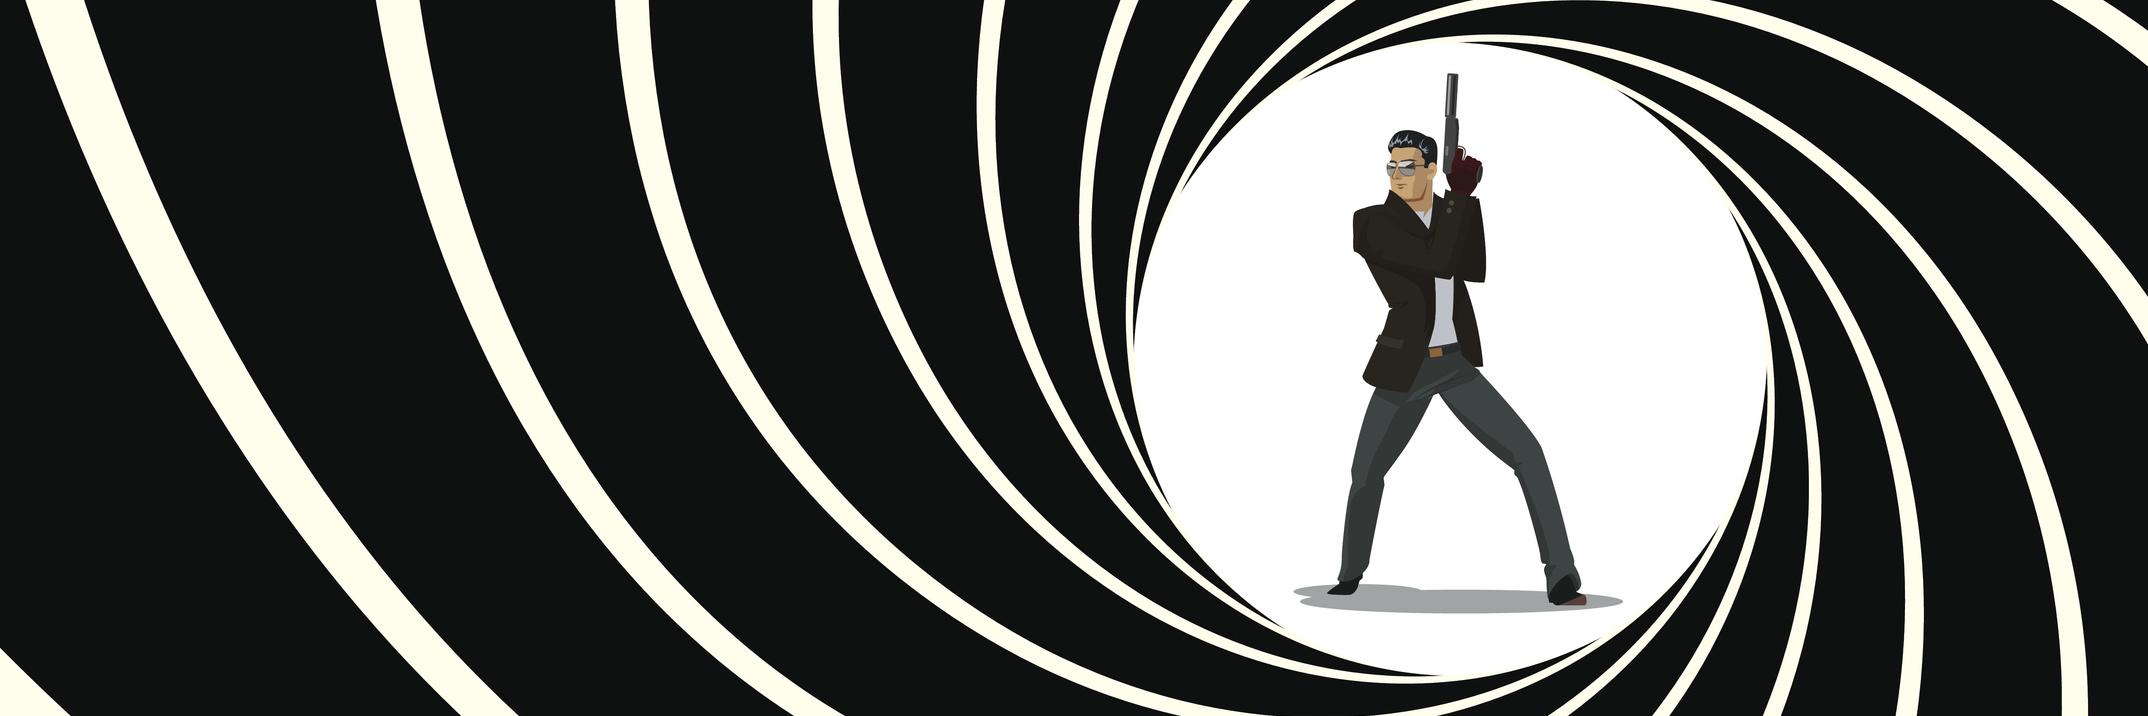 Secret agent.